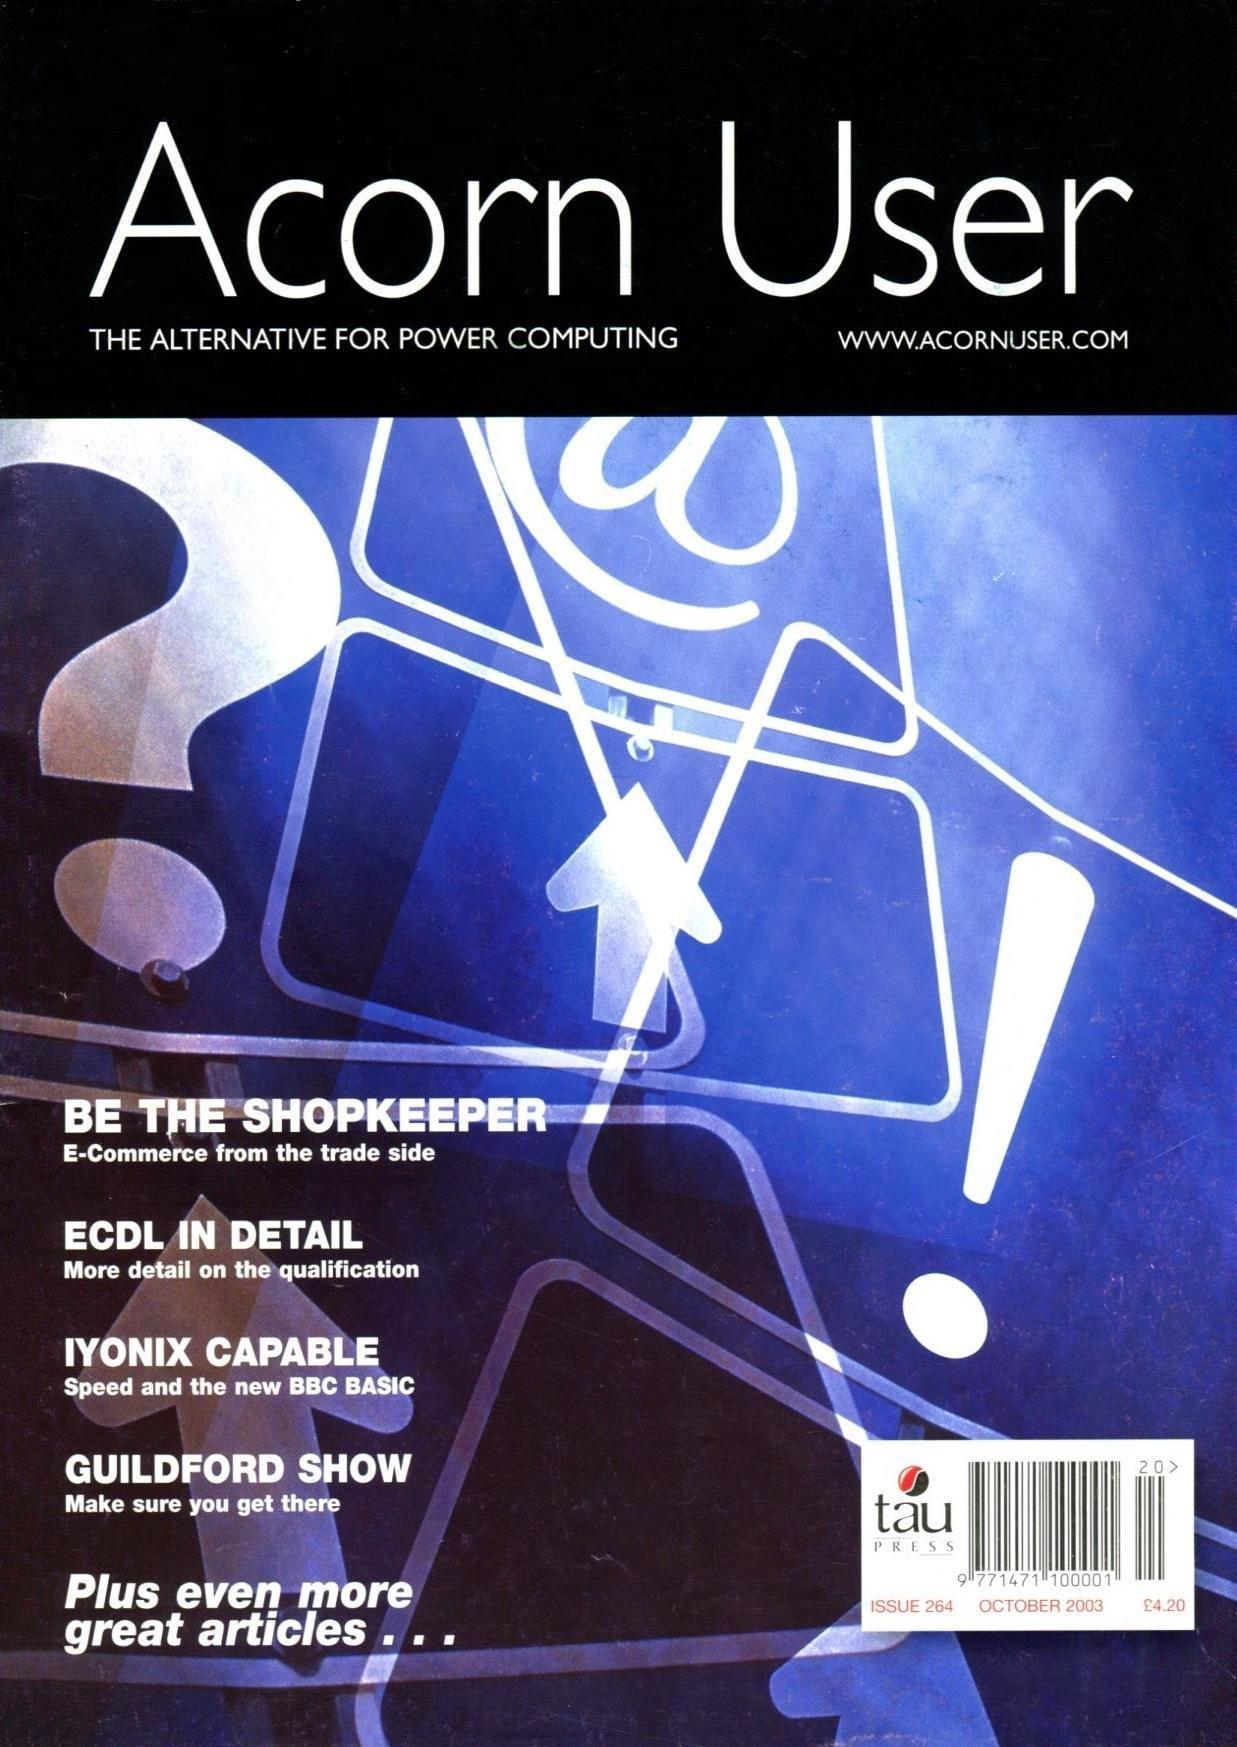 Acorn User 264 (October 2003)